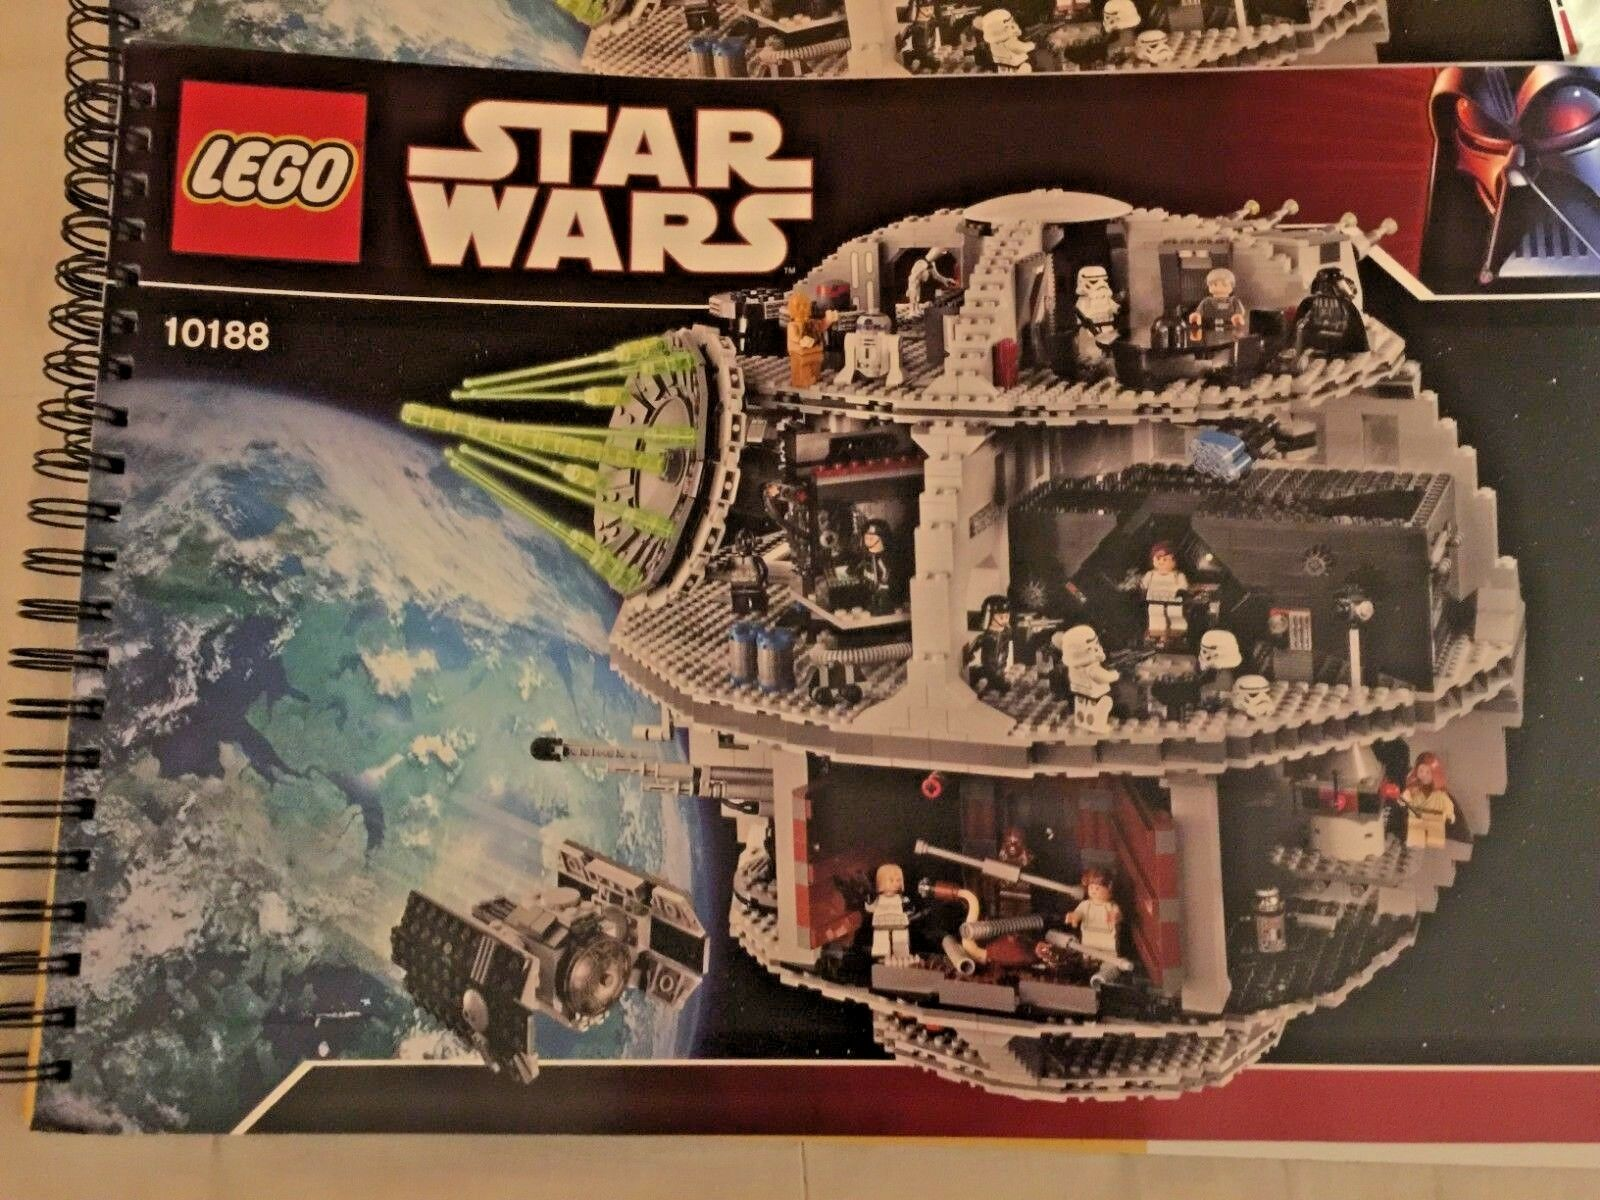 Istruzioni LEGO Star Star Star Wars 10188 Morte nera Death Star instructions book libro b50c19